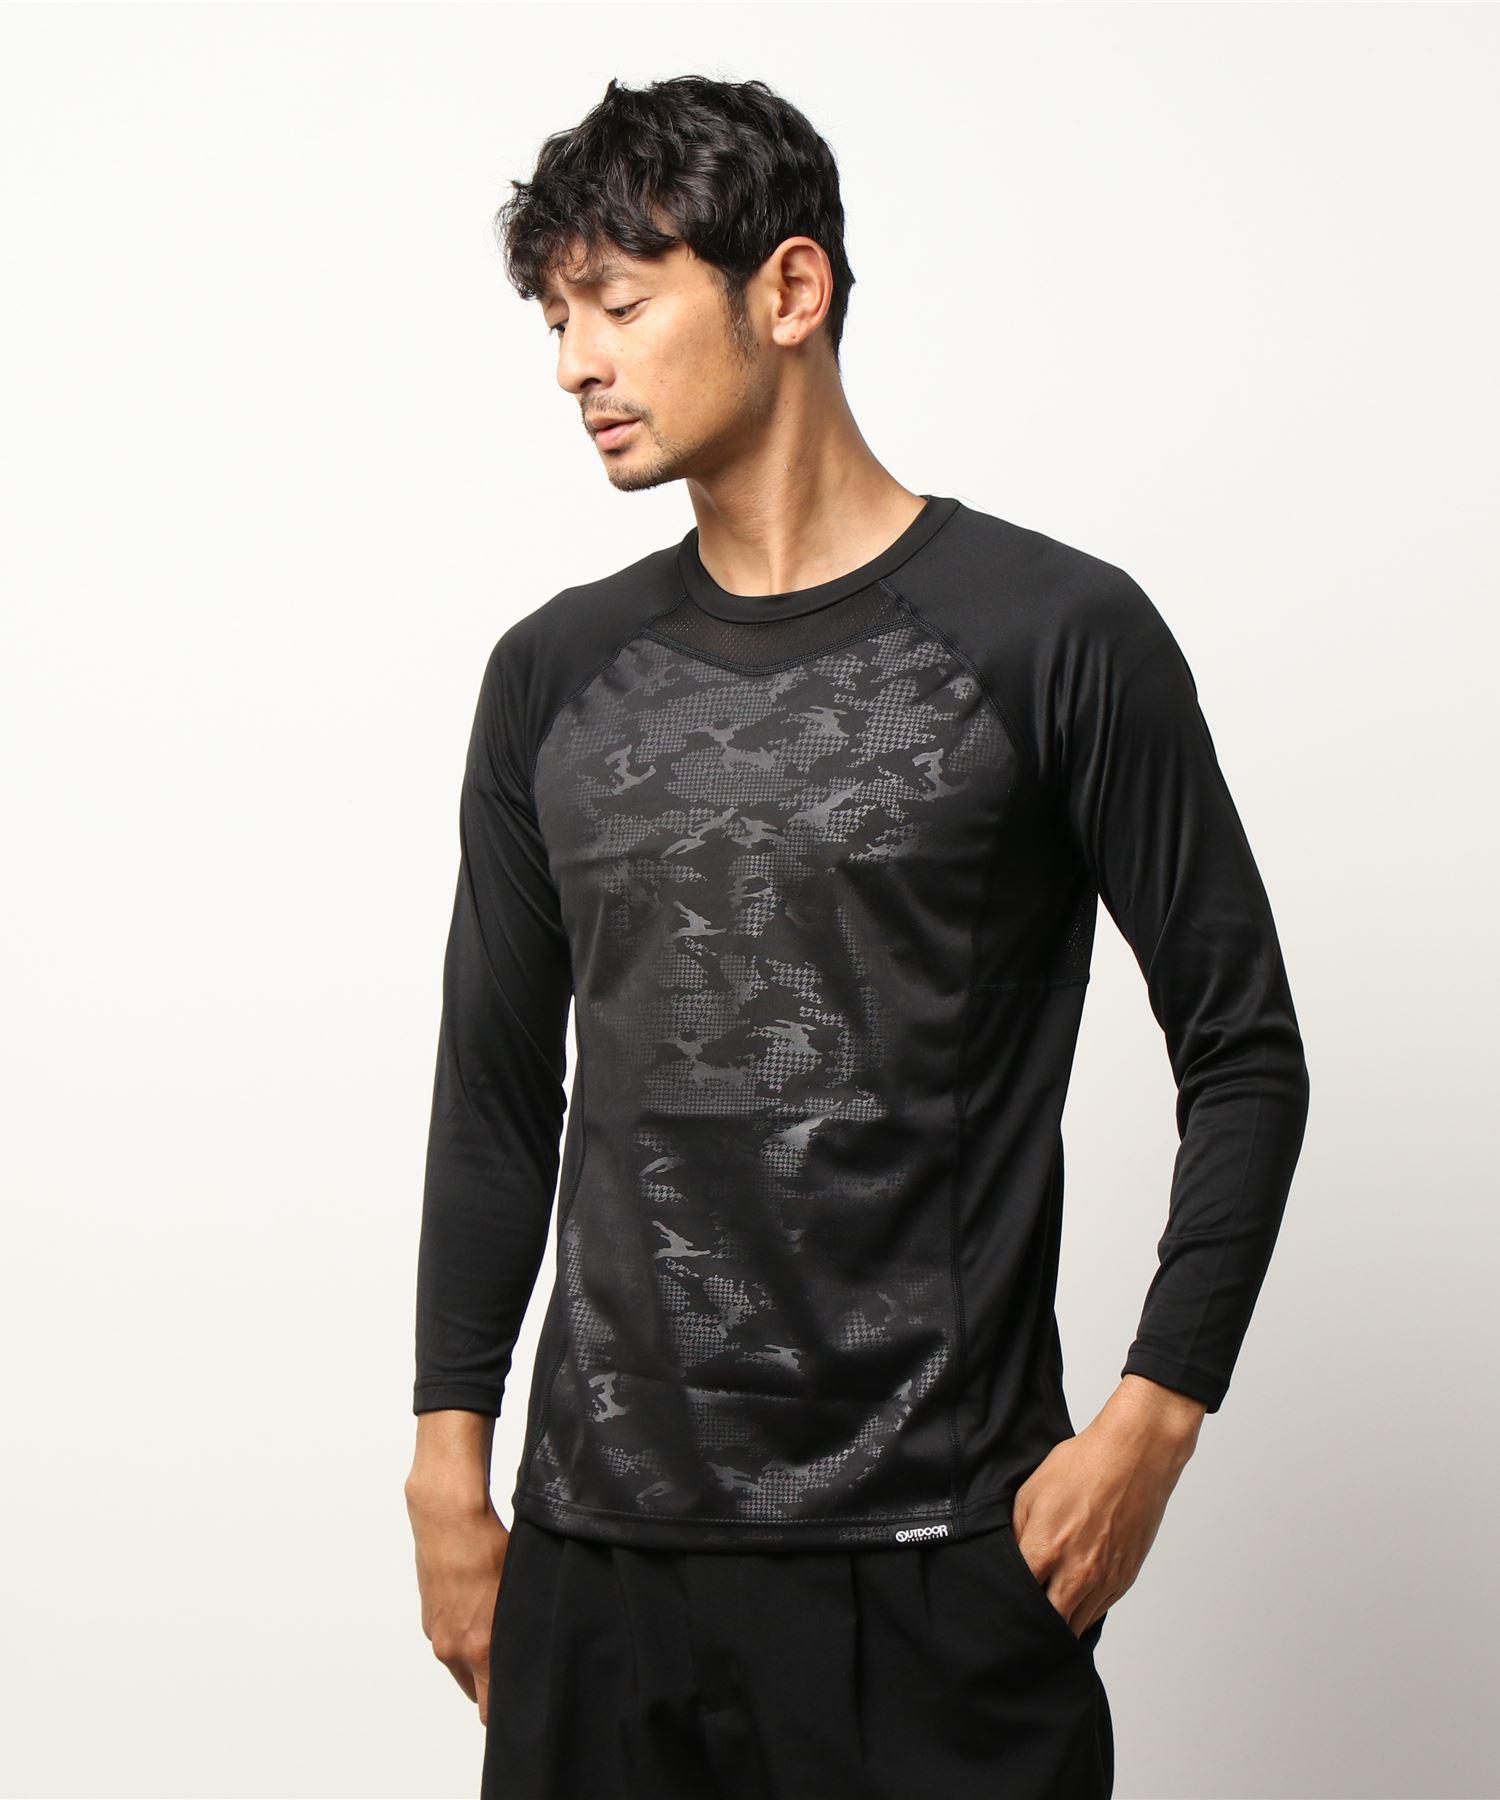 OUTDOOR PRODUCTS×BREEZETEX HYPER クルーネックロングTシャツ 防風透湿 衣服内温度+5℃